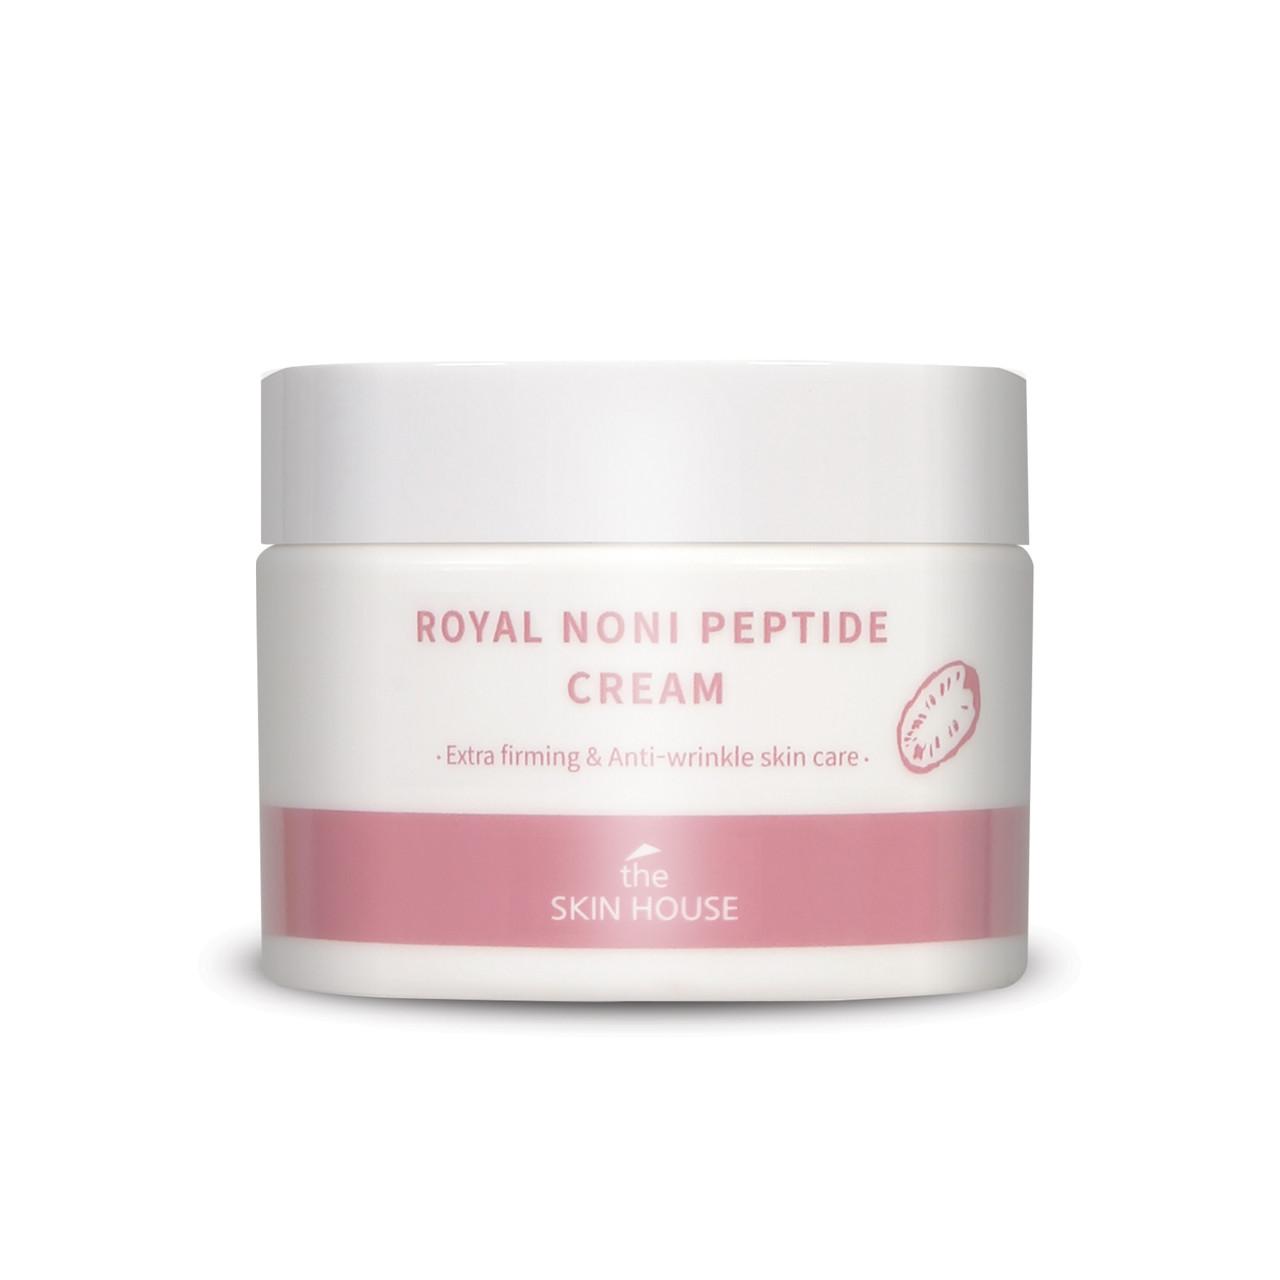 Укрепляющий крем против морщин с пептидами The Skin House Royal Noni Peptide Cream, 50 мл